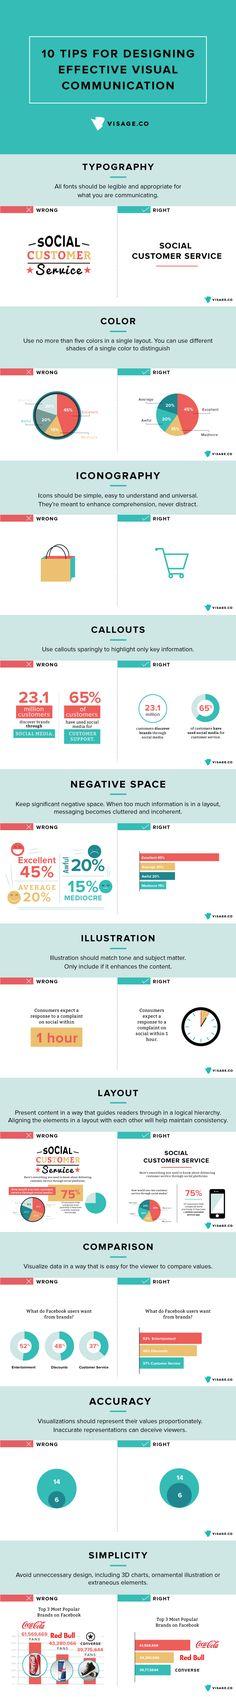 Designing Effective Visual Communication #Infographic | via #BornToBeSocial - Pinterest Marketing